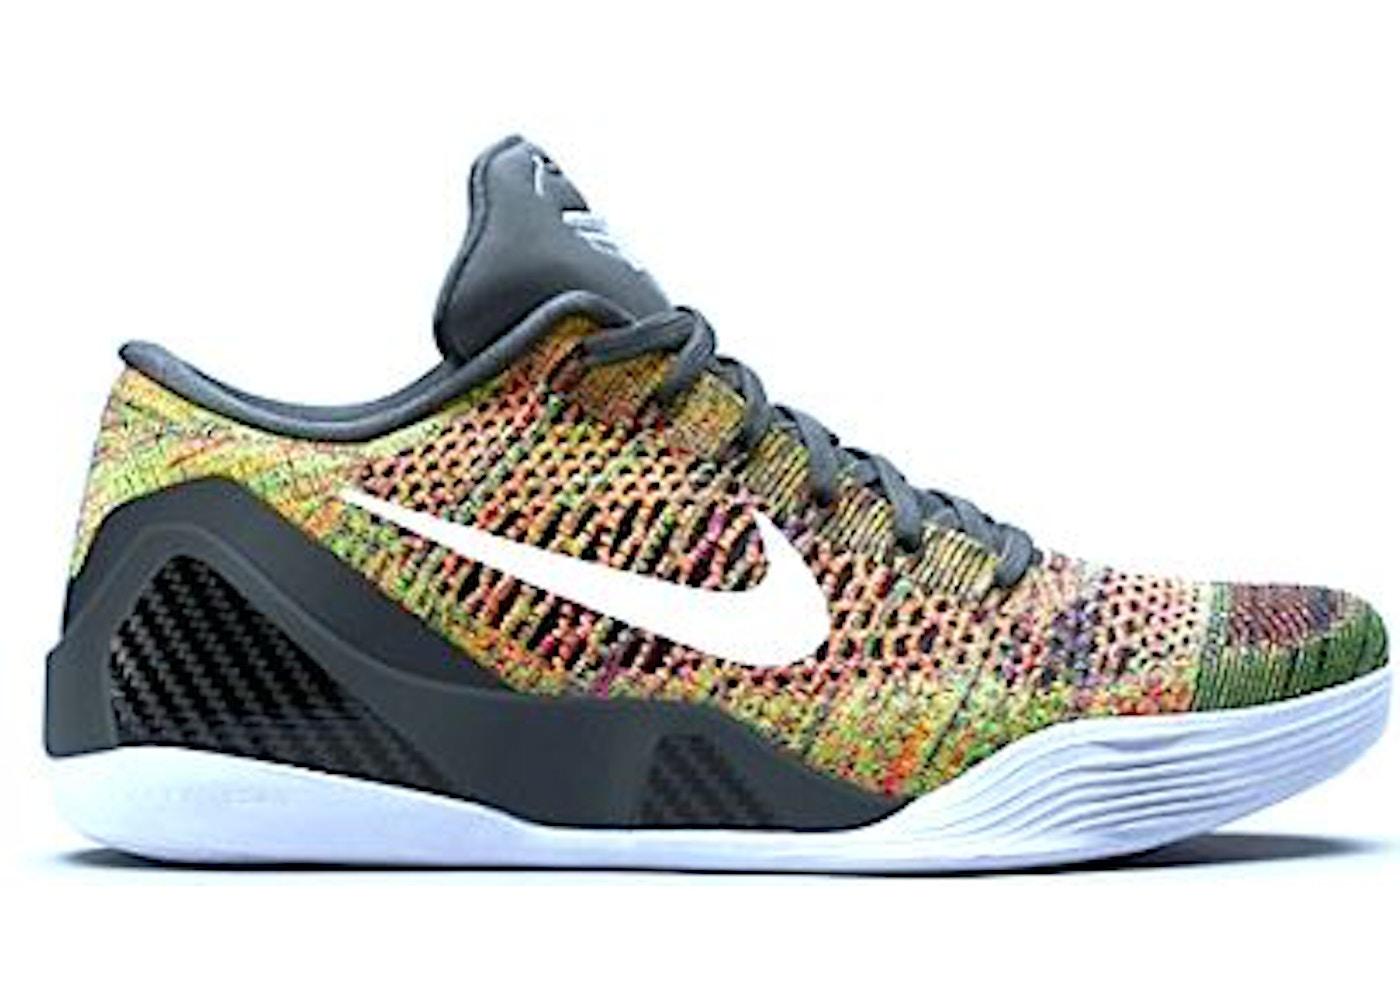 competitive price 0fb70 51baa Kobe 9 Elite Low Multicolor (NikeID)(Black Tongue) - 138953